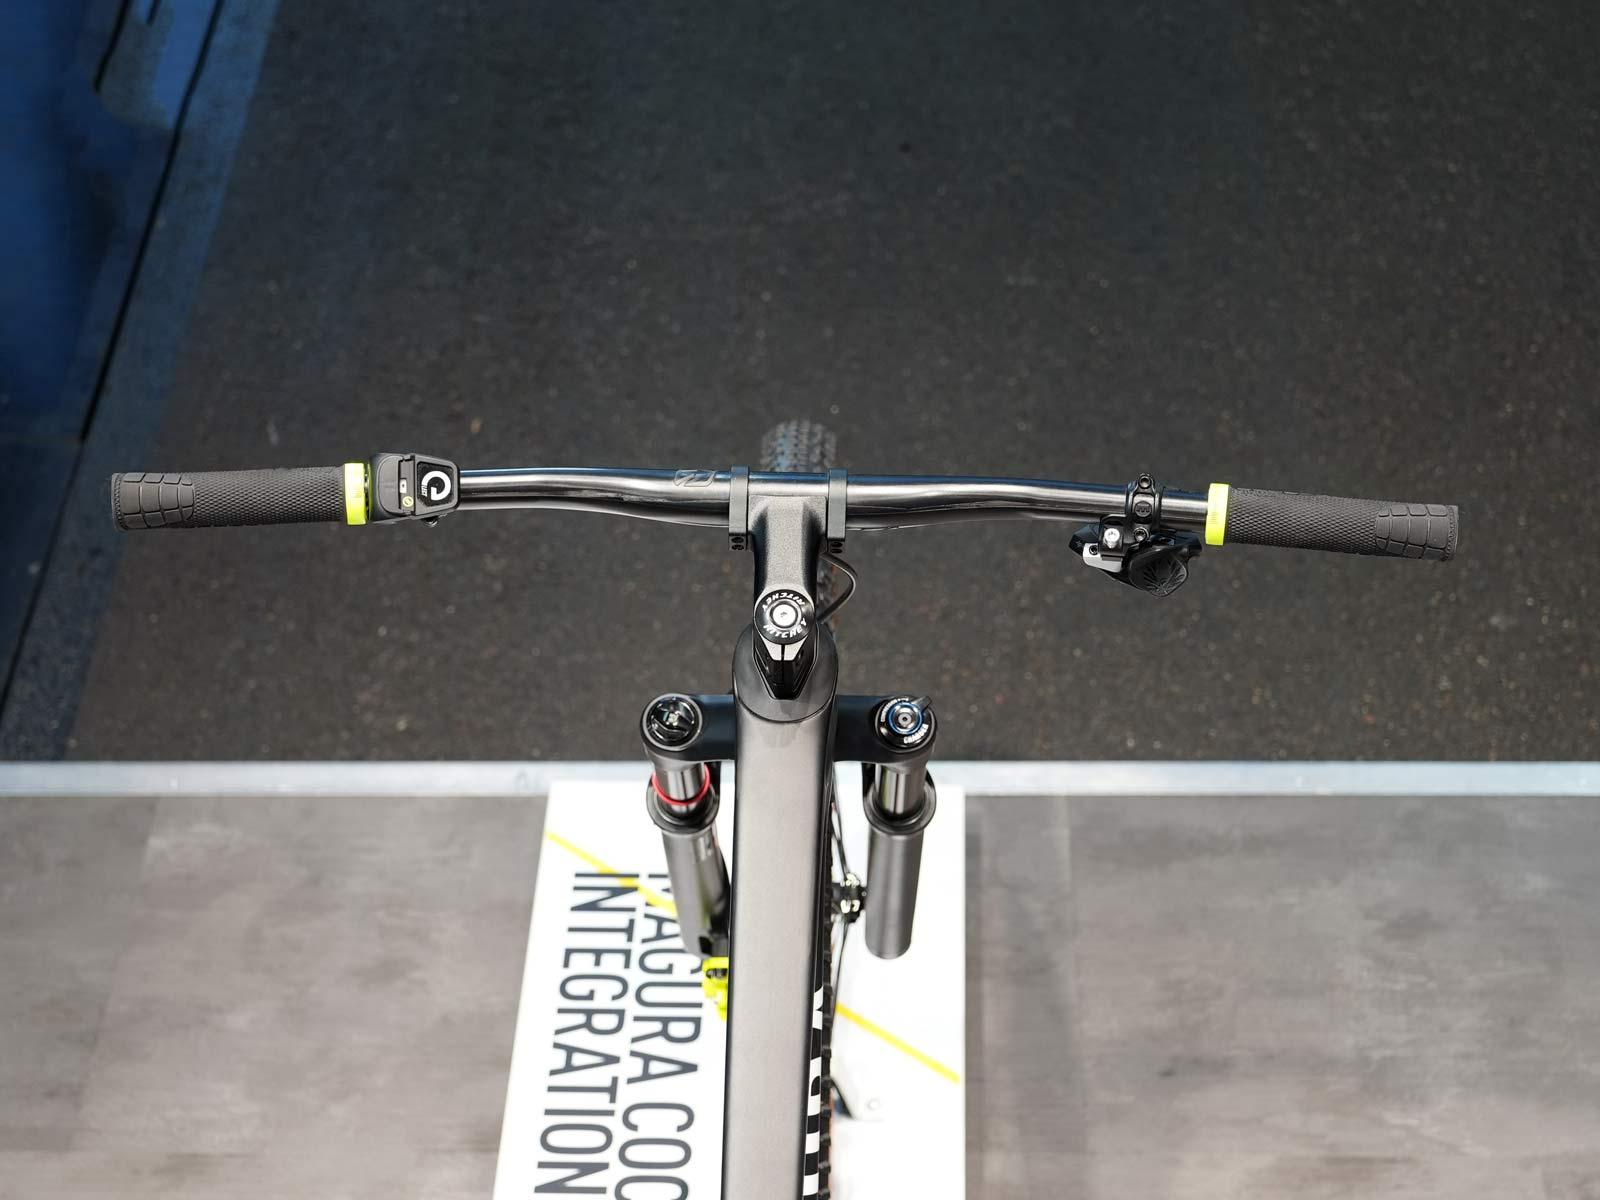 magura iC integrated cockpit concept with hidden brake lever master cylinder